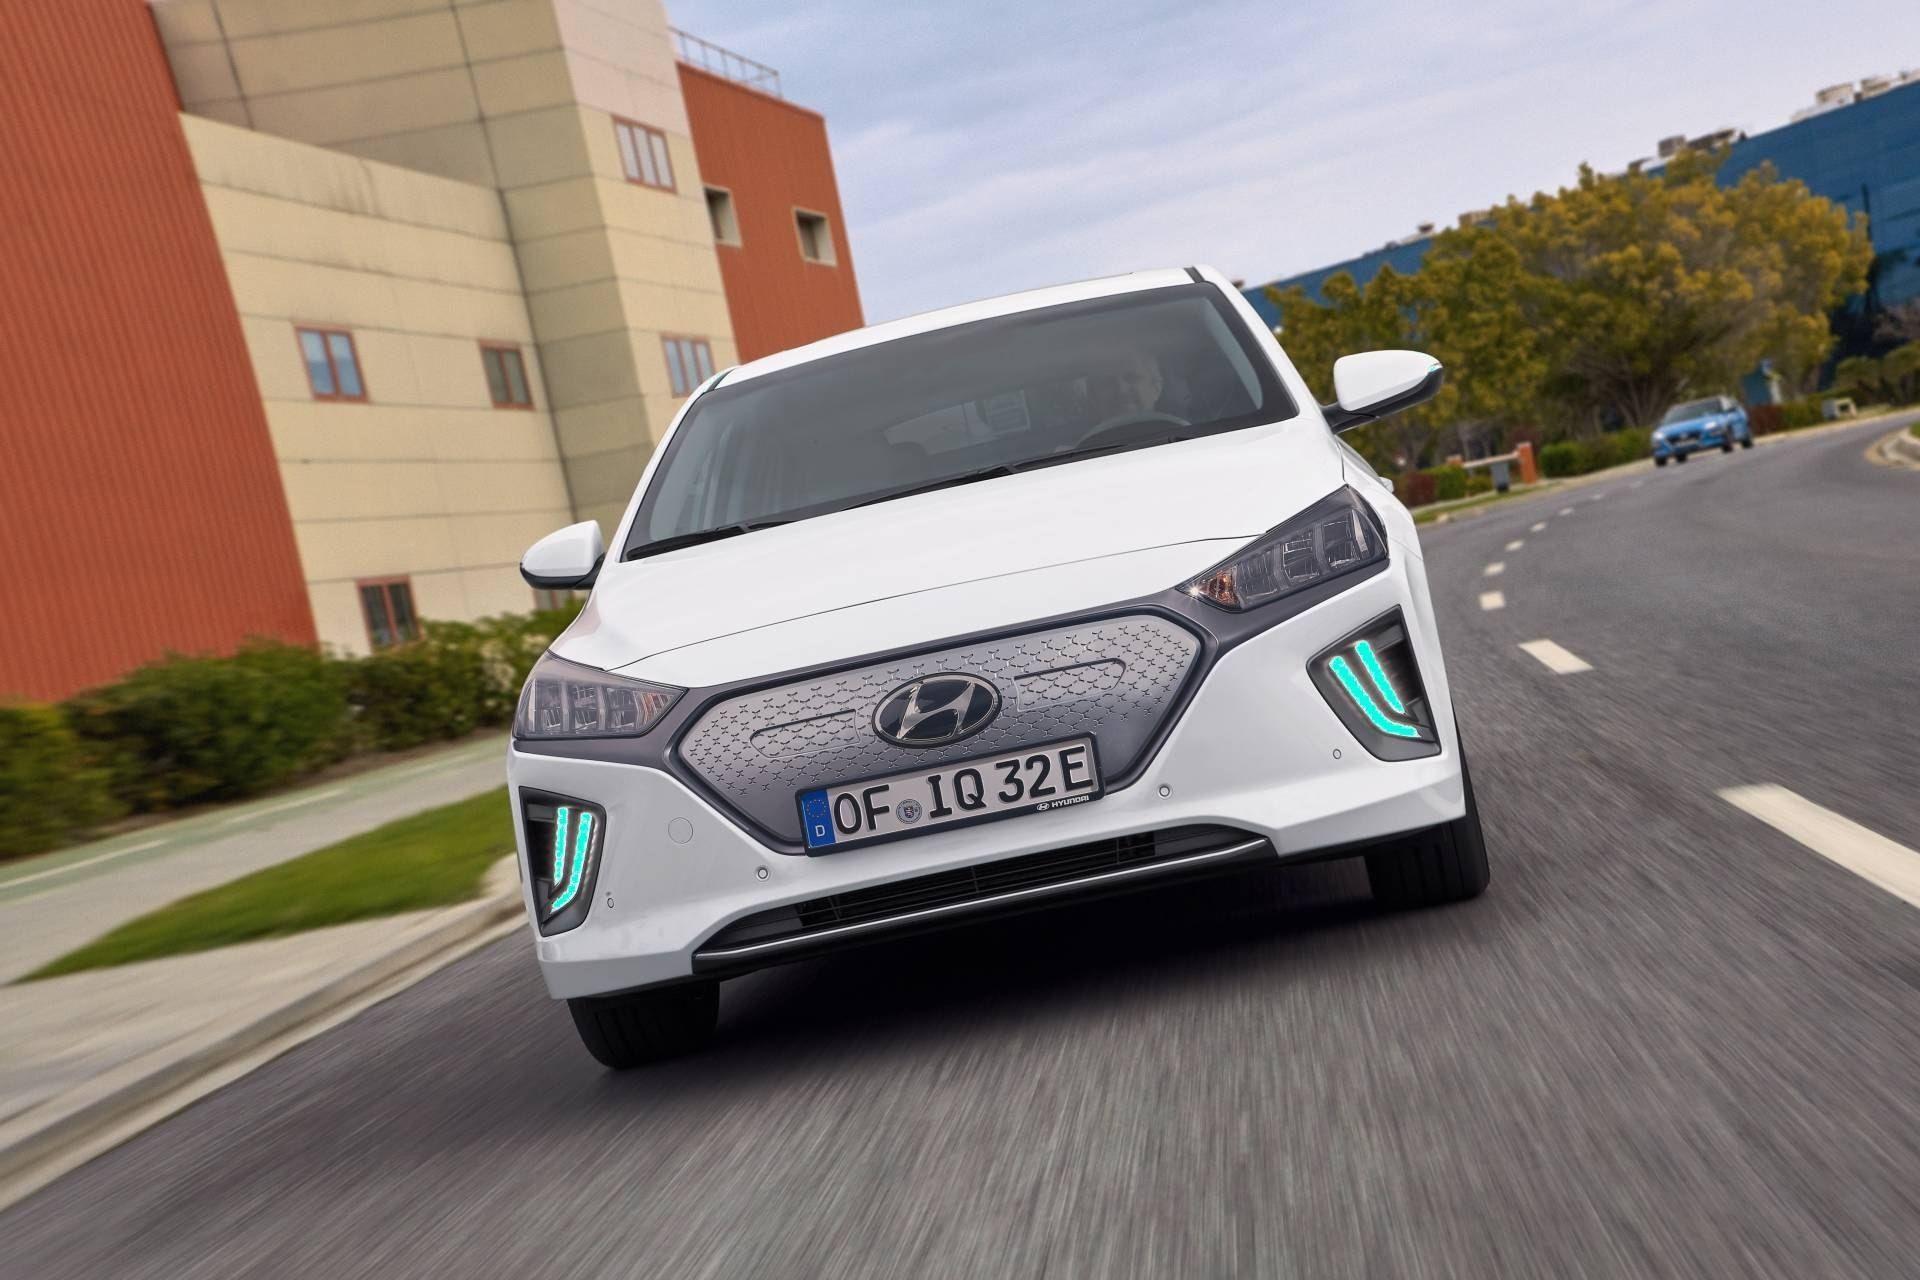 Hyundai Ioniq Electric 2020 Specs And Review Hyundai Electric Car Hyundai Car